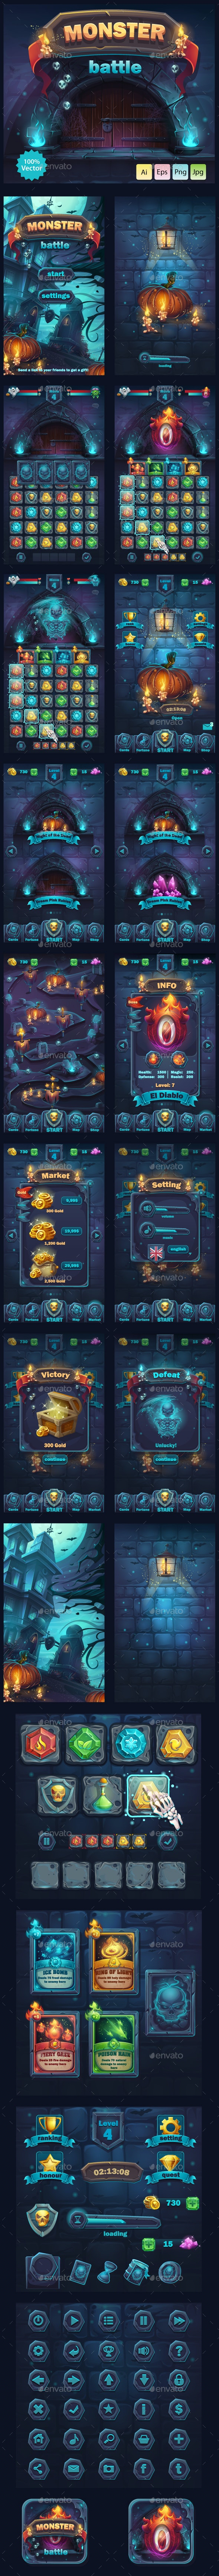 Monster Battle GUI - User Interfaces Game Assets